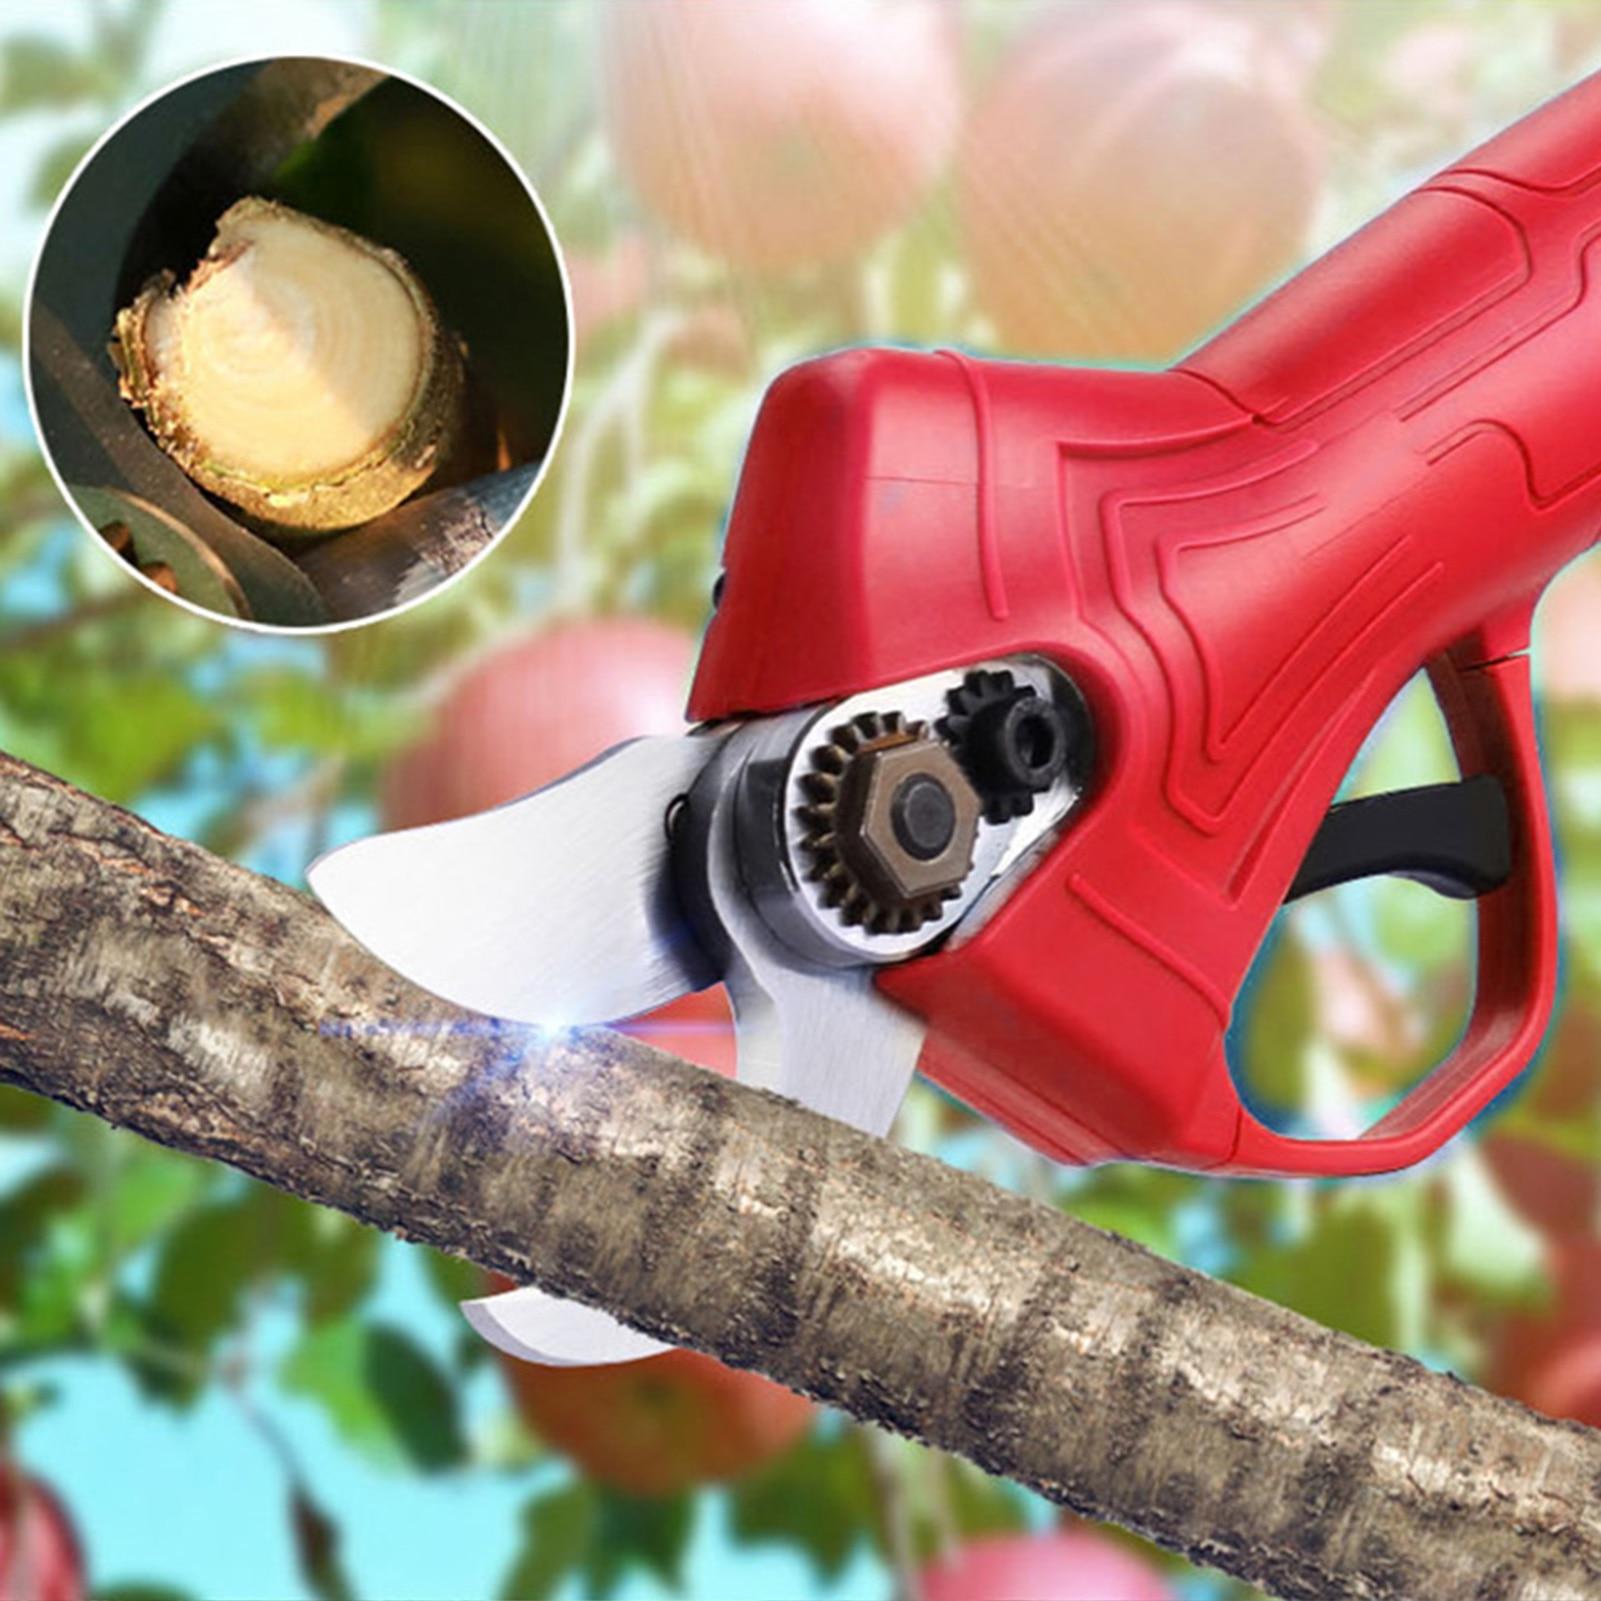 Tools : 21V Electric Pruning Shears Tree Branch Pruner Lithium-ion Pruning Shear Fruit Tree Bonsai Pruning Electric Tree Branches Cutter